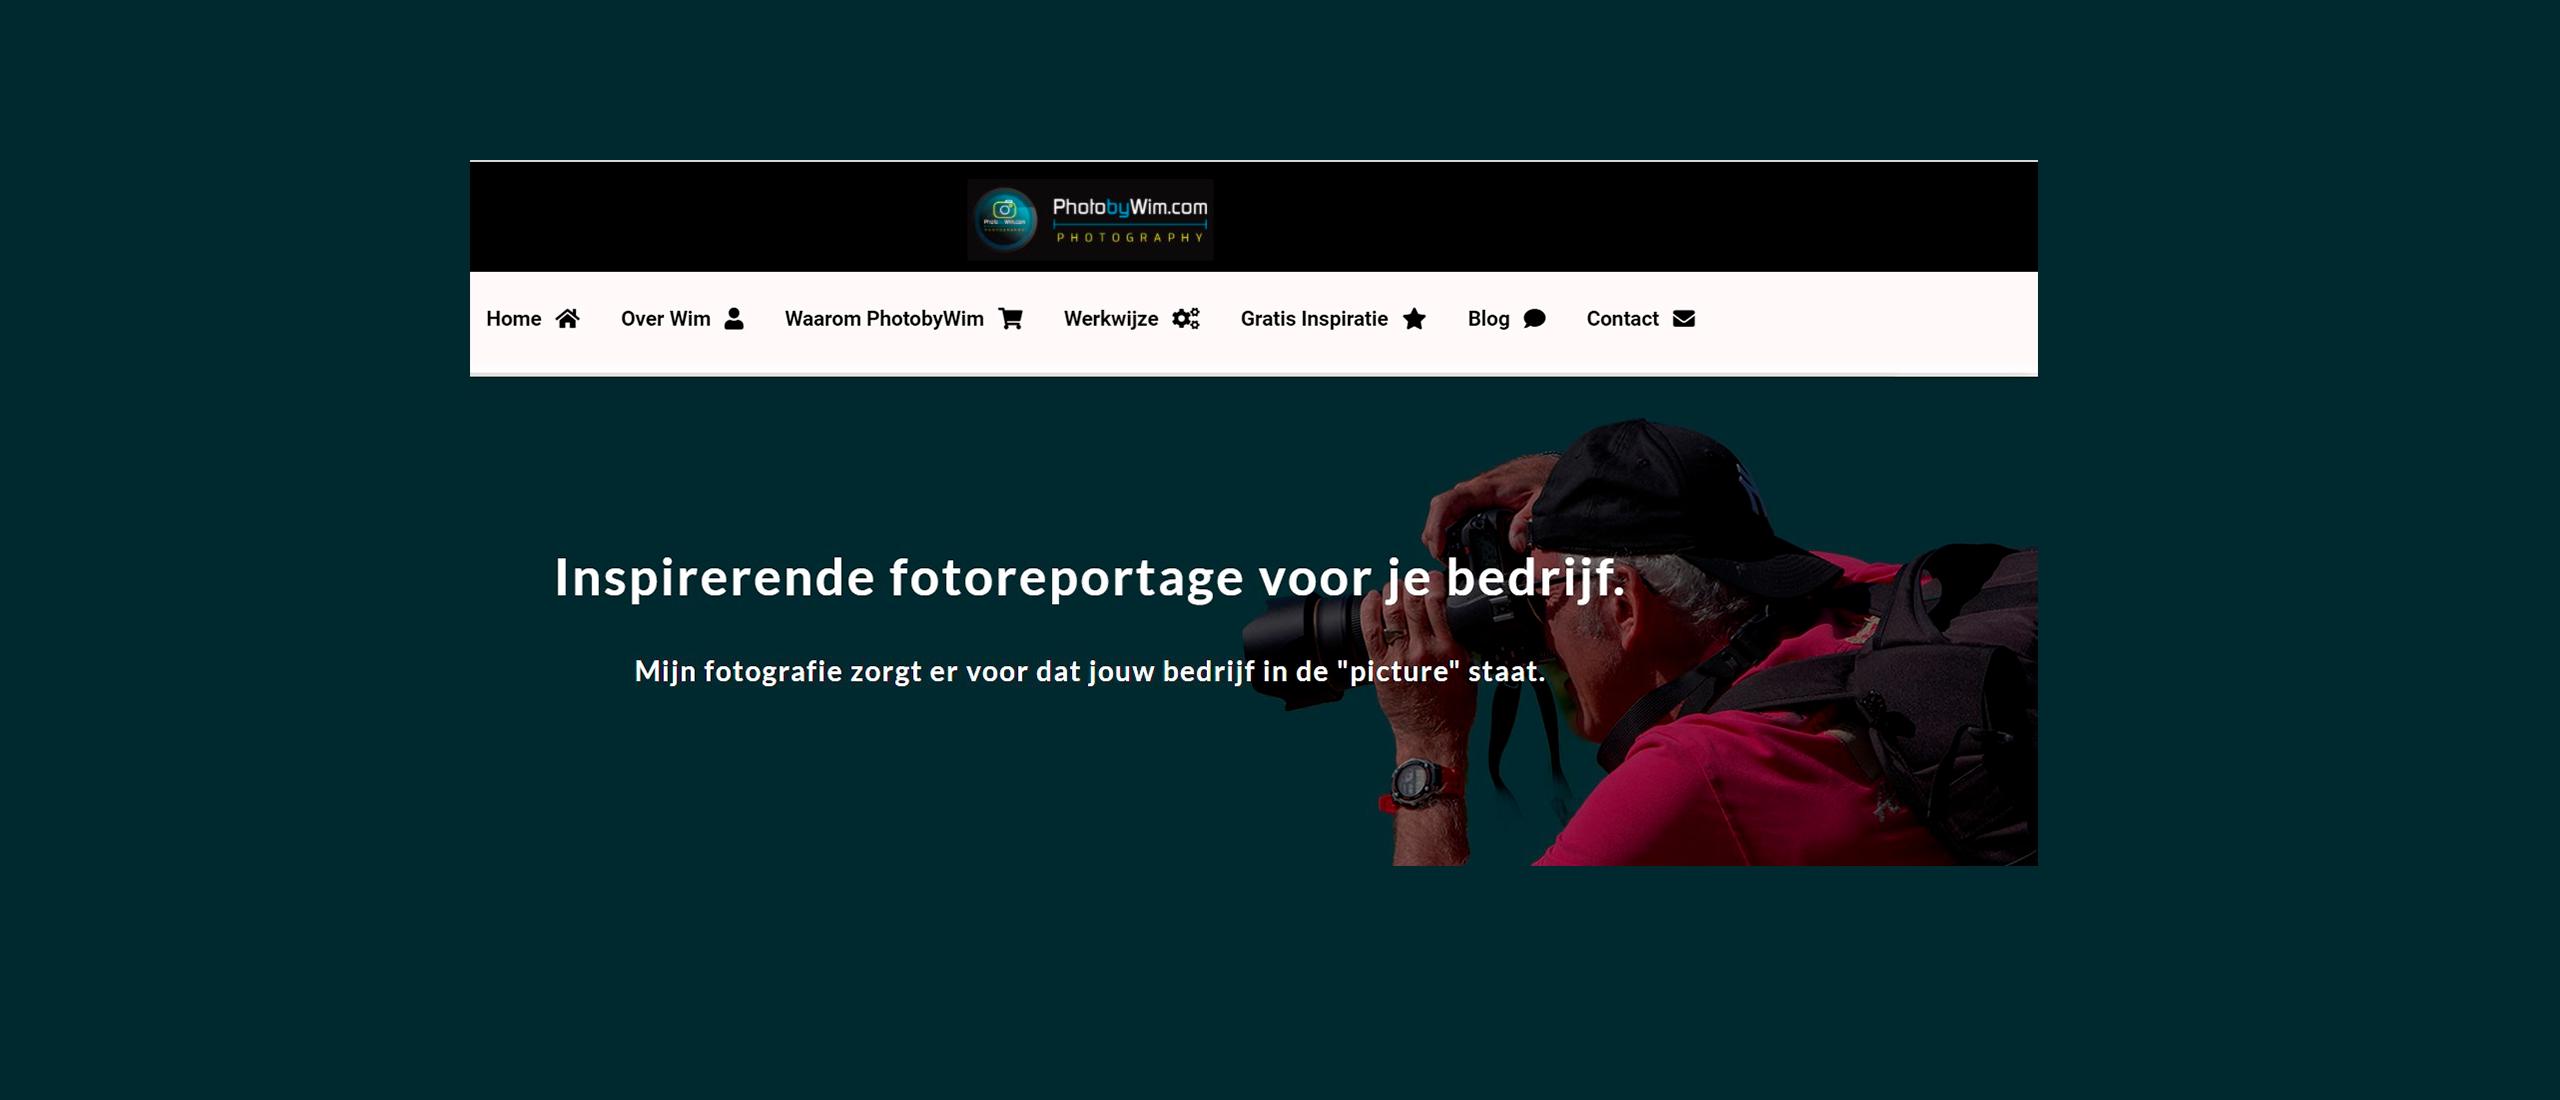 Geheel nieuwe website Photobywim Live